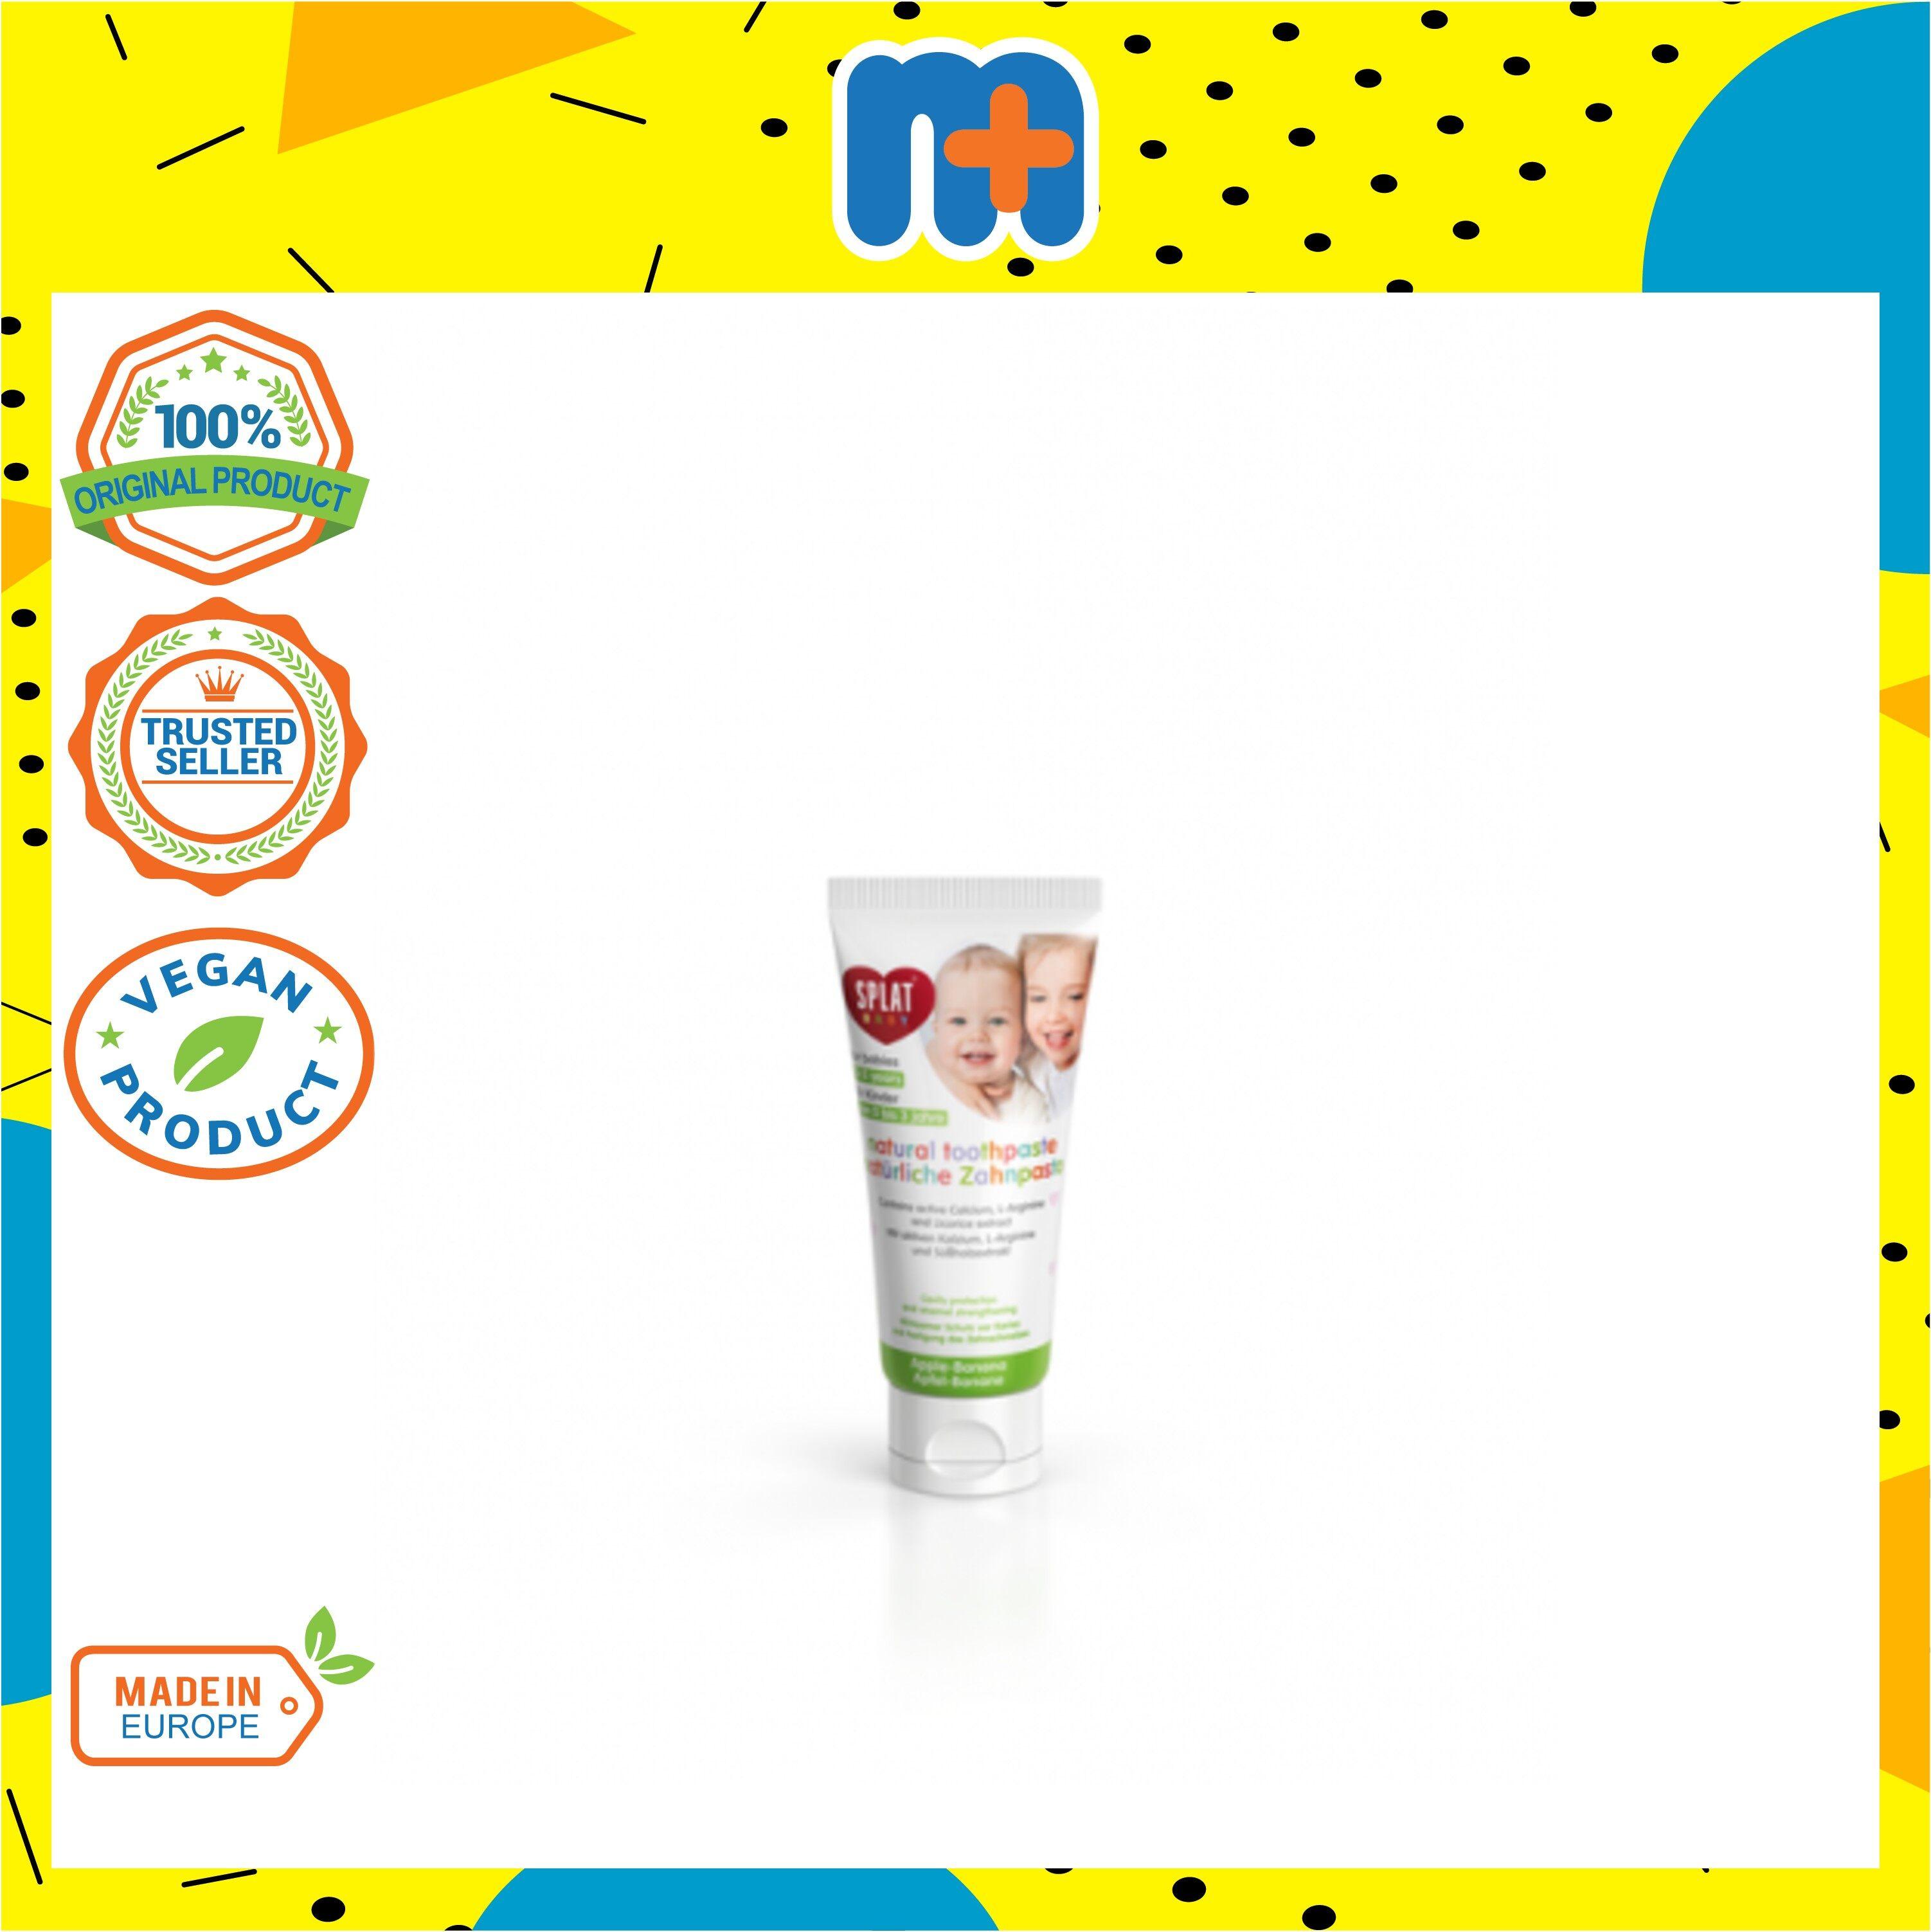 [MPLUS] SPLAT Baby Toothpaste [Apple Banana] With Fingertip Toothbrush 40ml